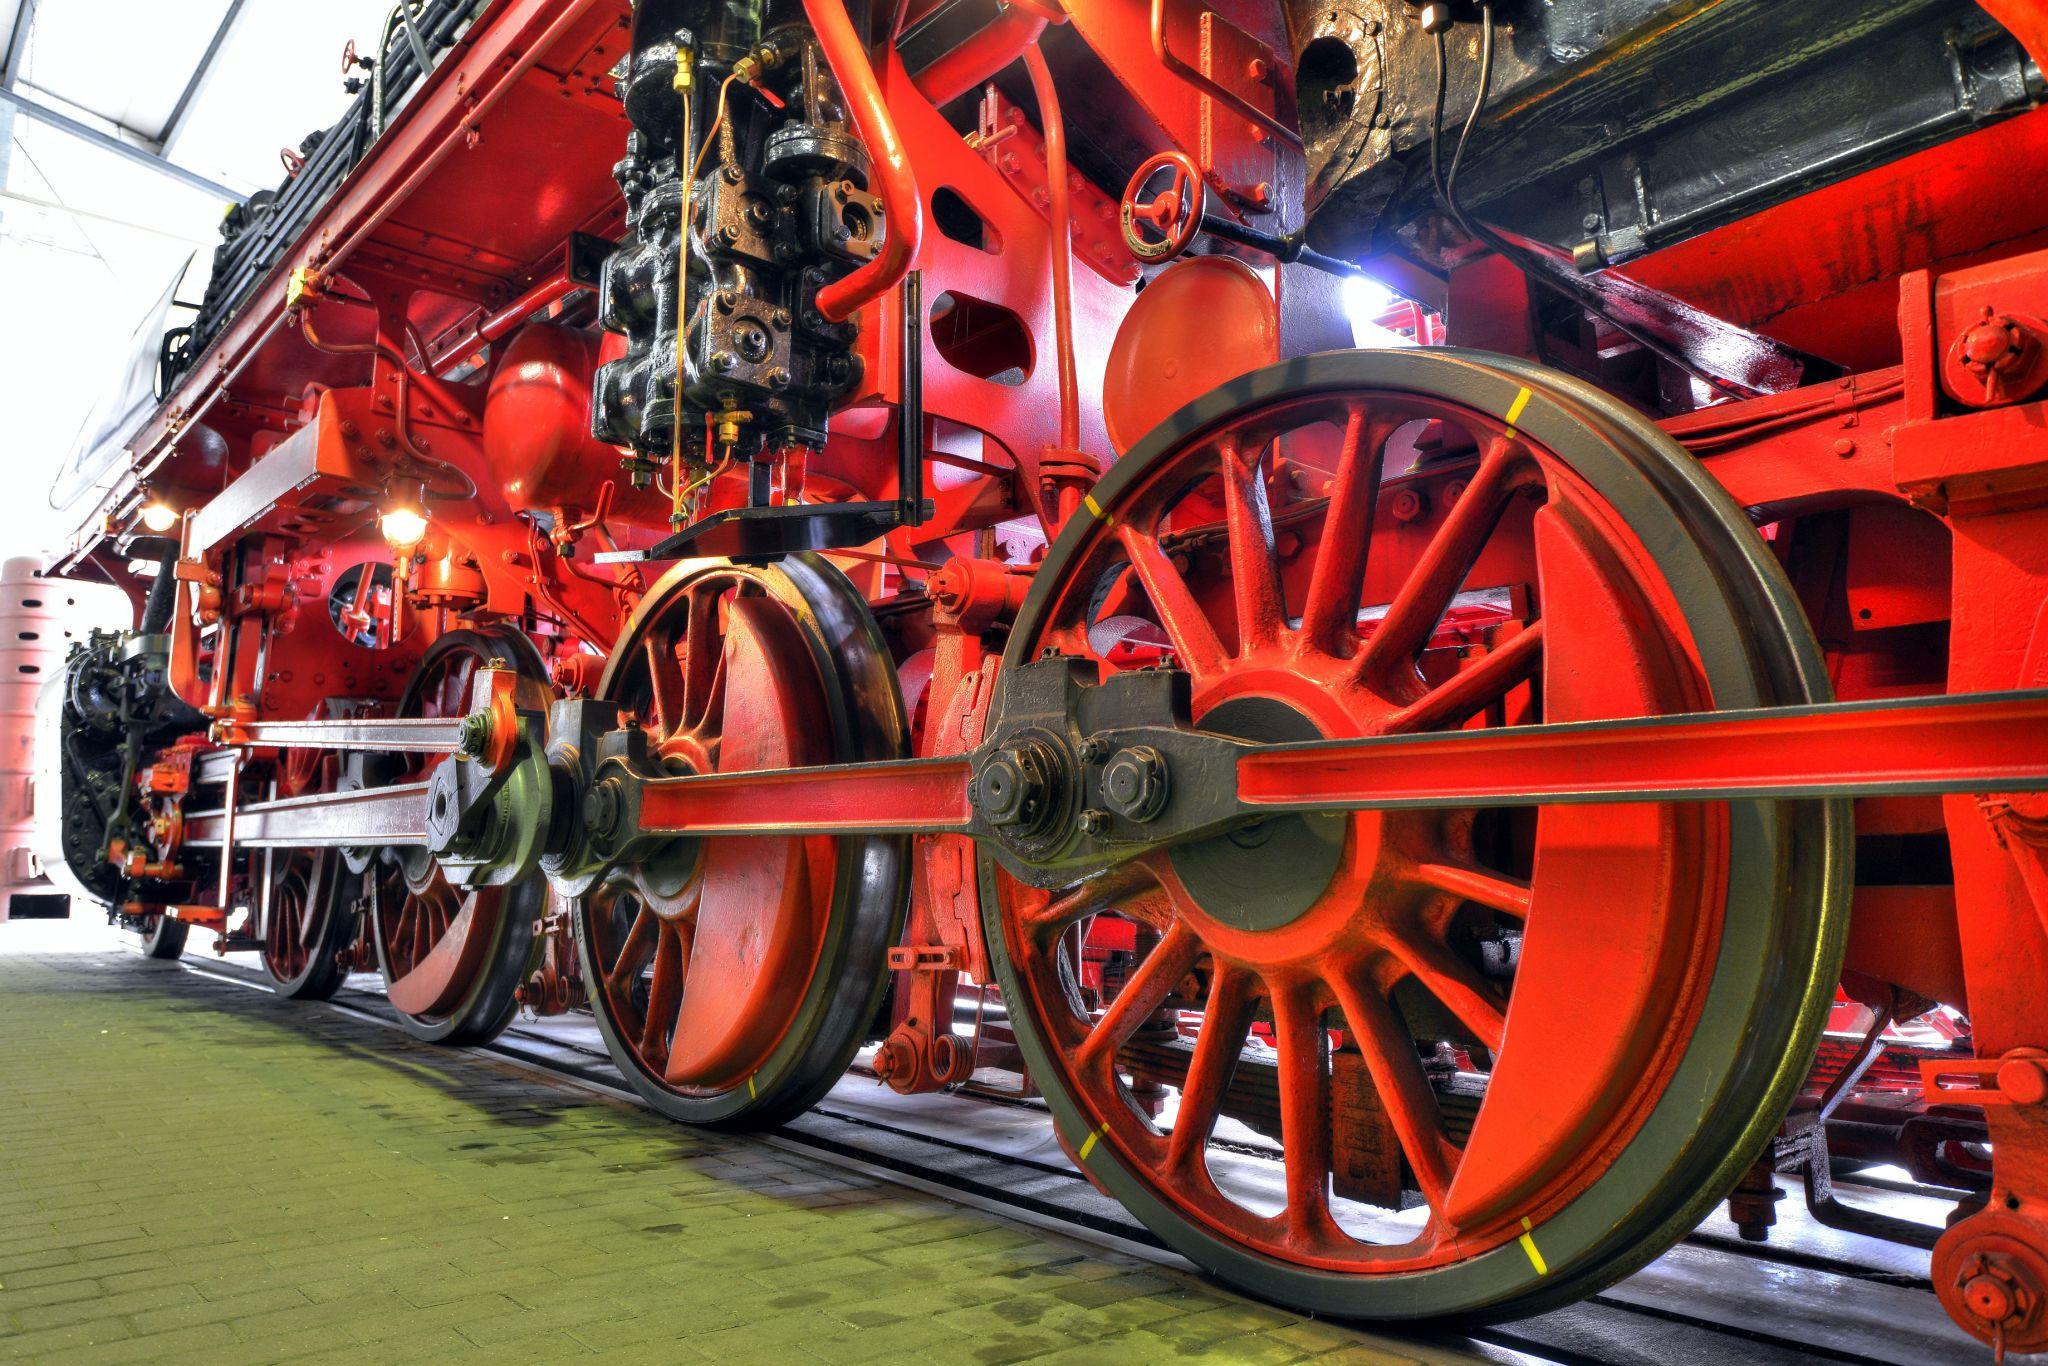 Eisenbahnmuseum Bochum, Germany